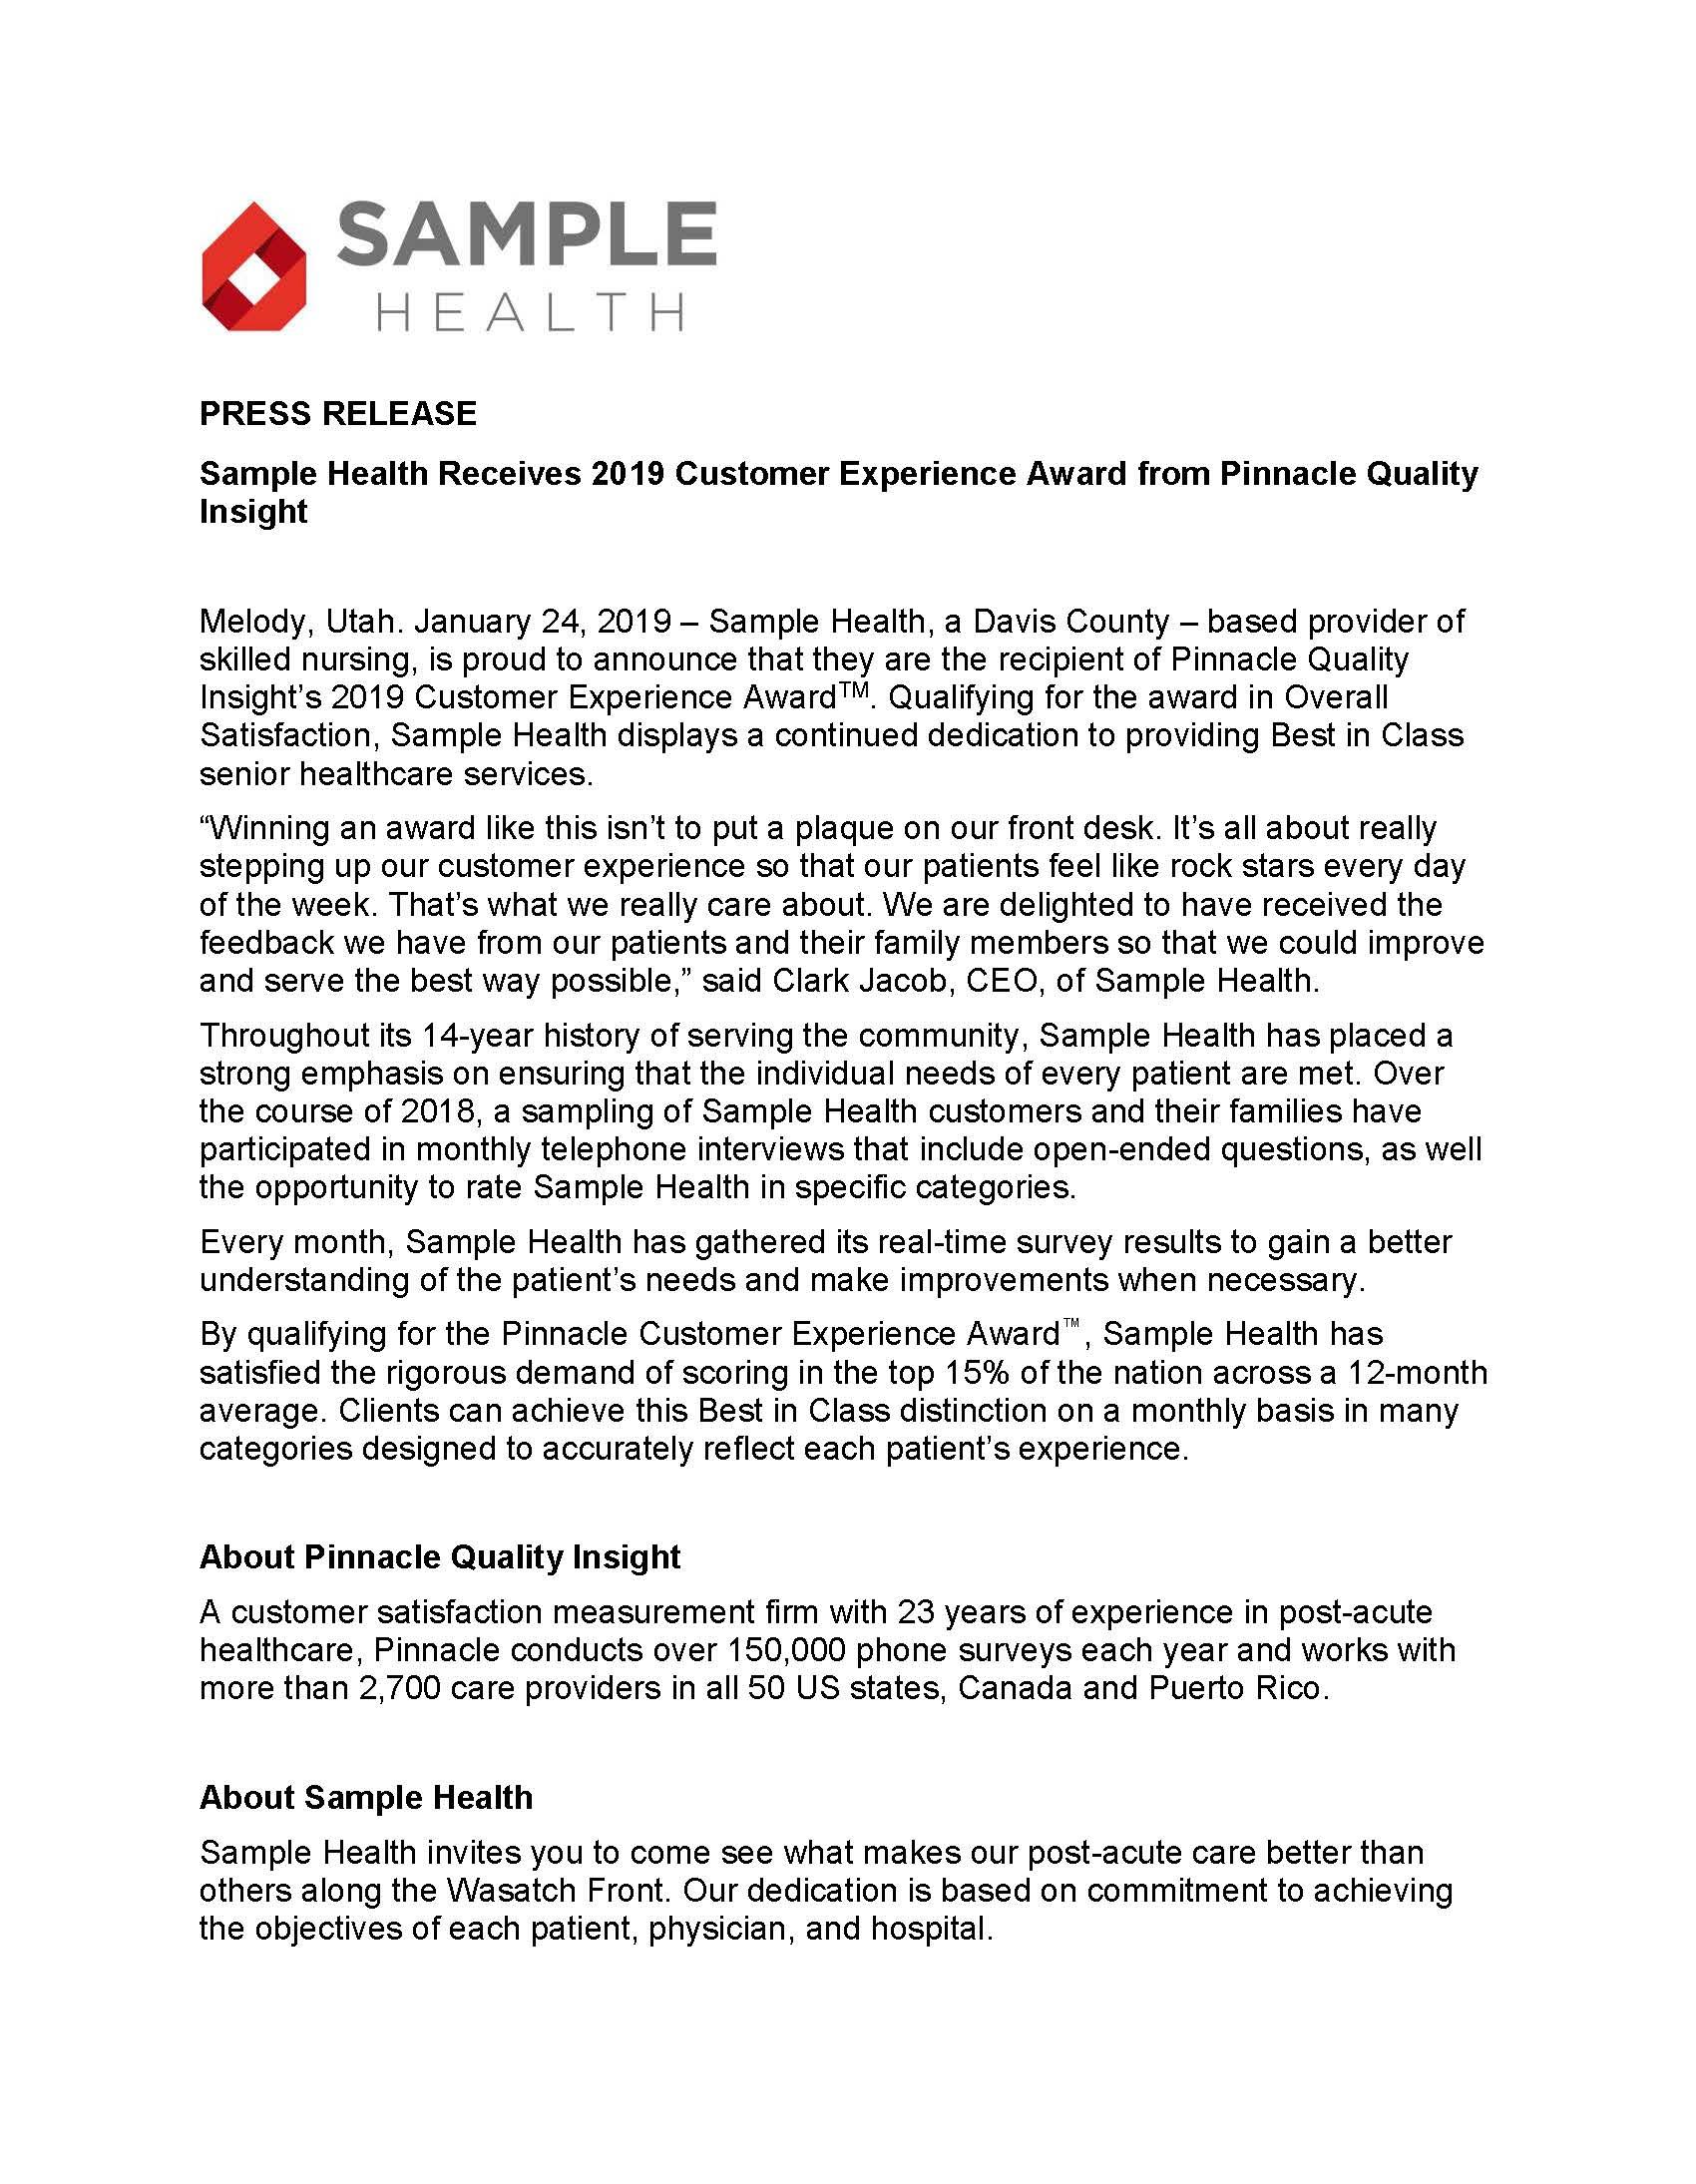 Press Release Example.jpg